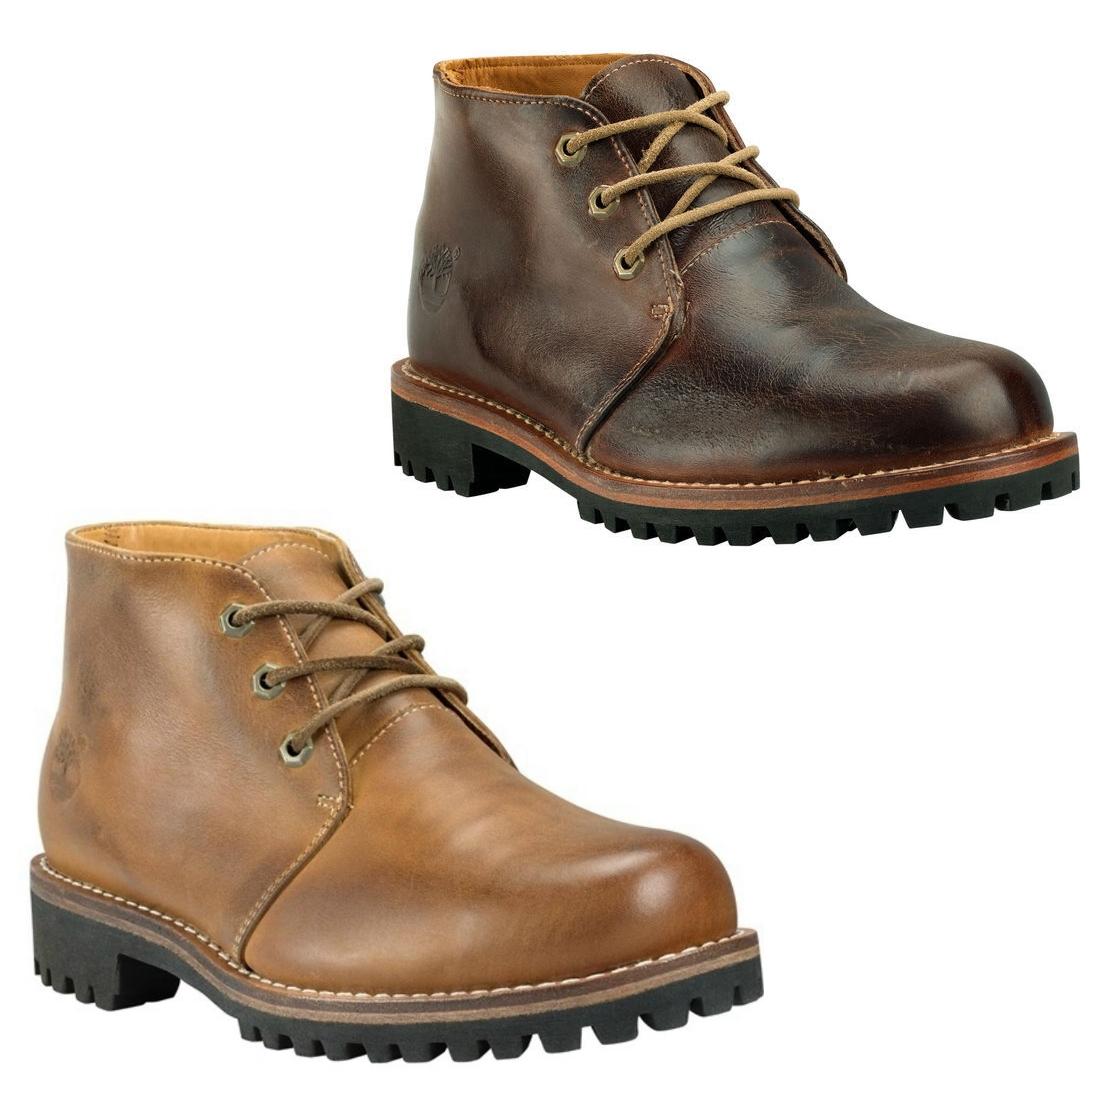 Timberland-Men-s-EK-Heritage-Rugged-WP-Chukka-Schuhe-Stiefel-Boots-Herren-Braun